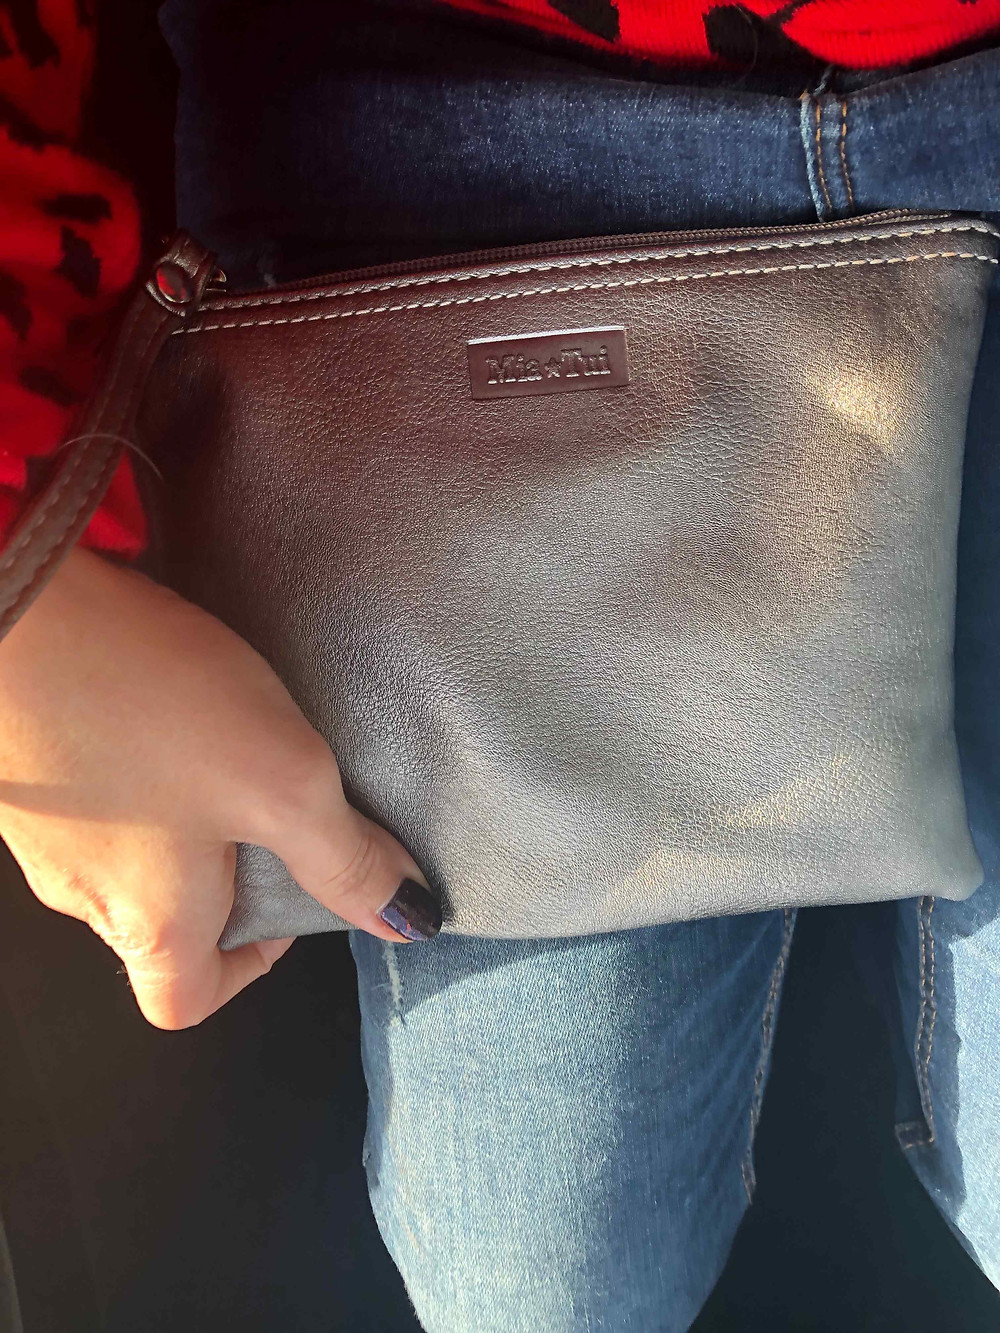 Metallic grey Mia Tui Samantha clutch bag with wrist strap